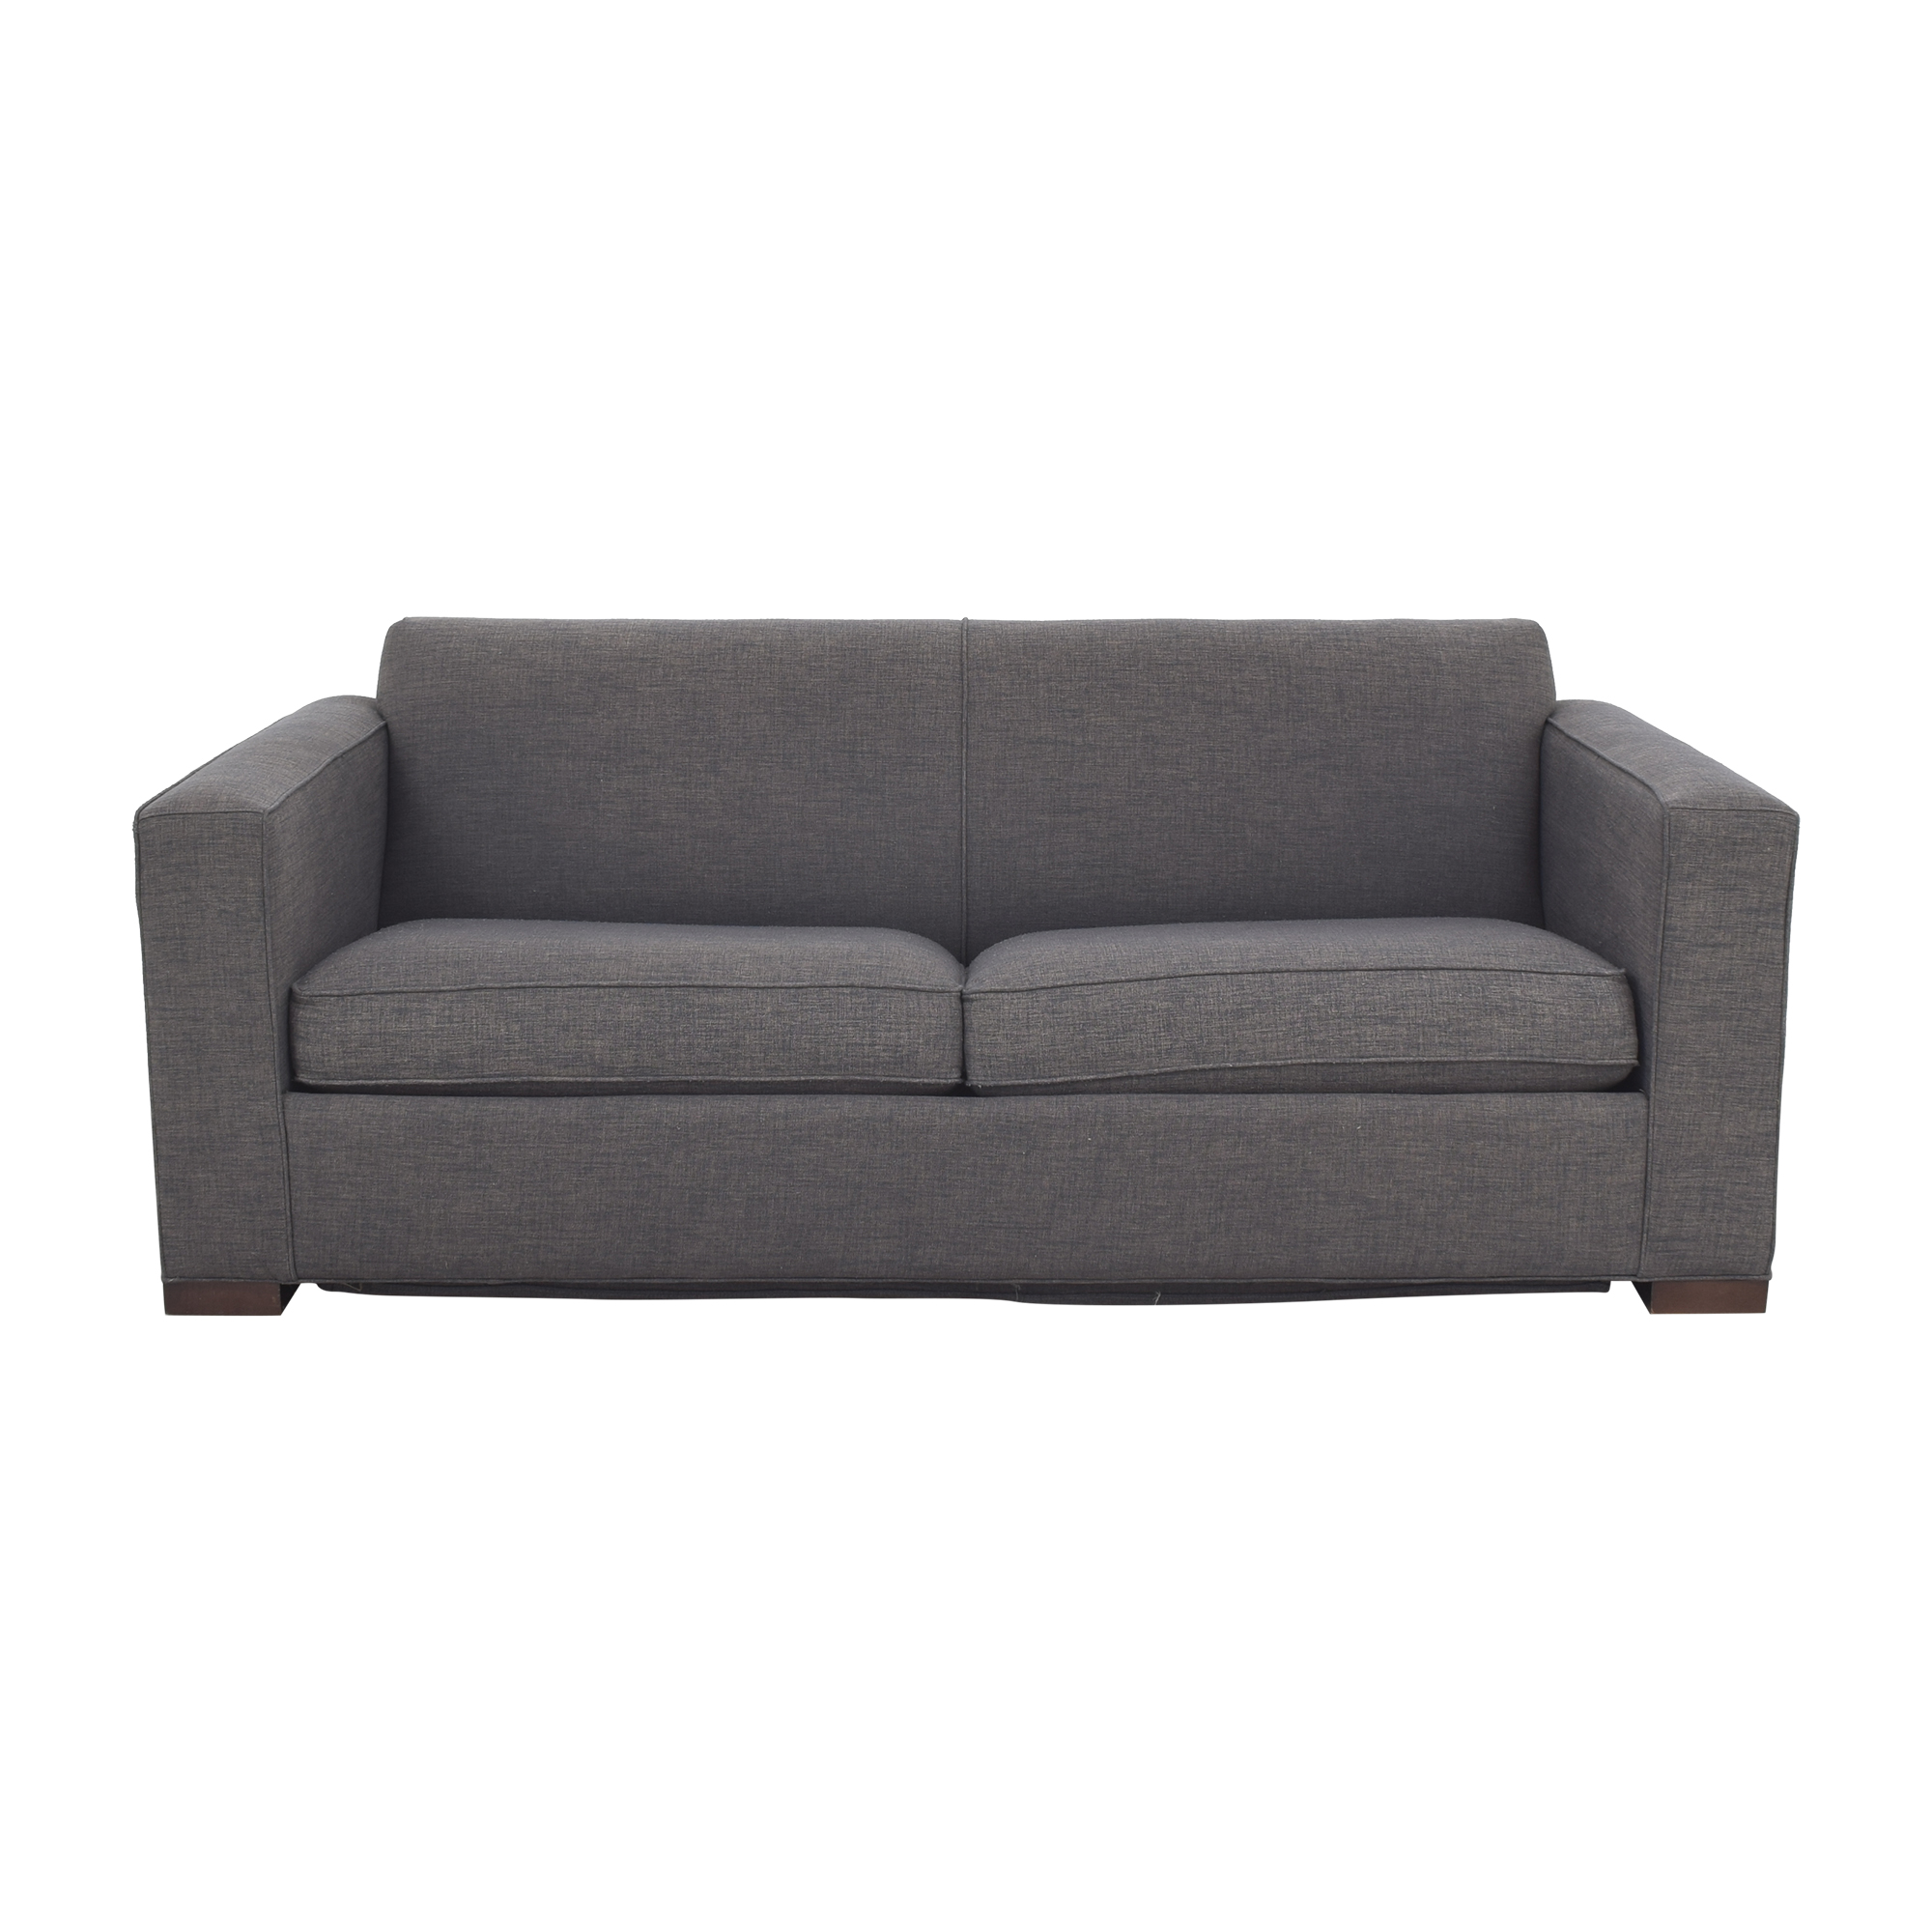 ABC Carpet & Home Cobble Hill Sleeper Sofa / Sofa Beds